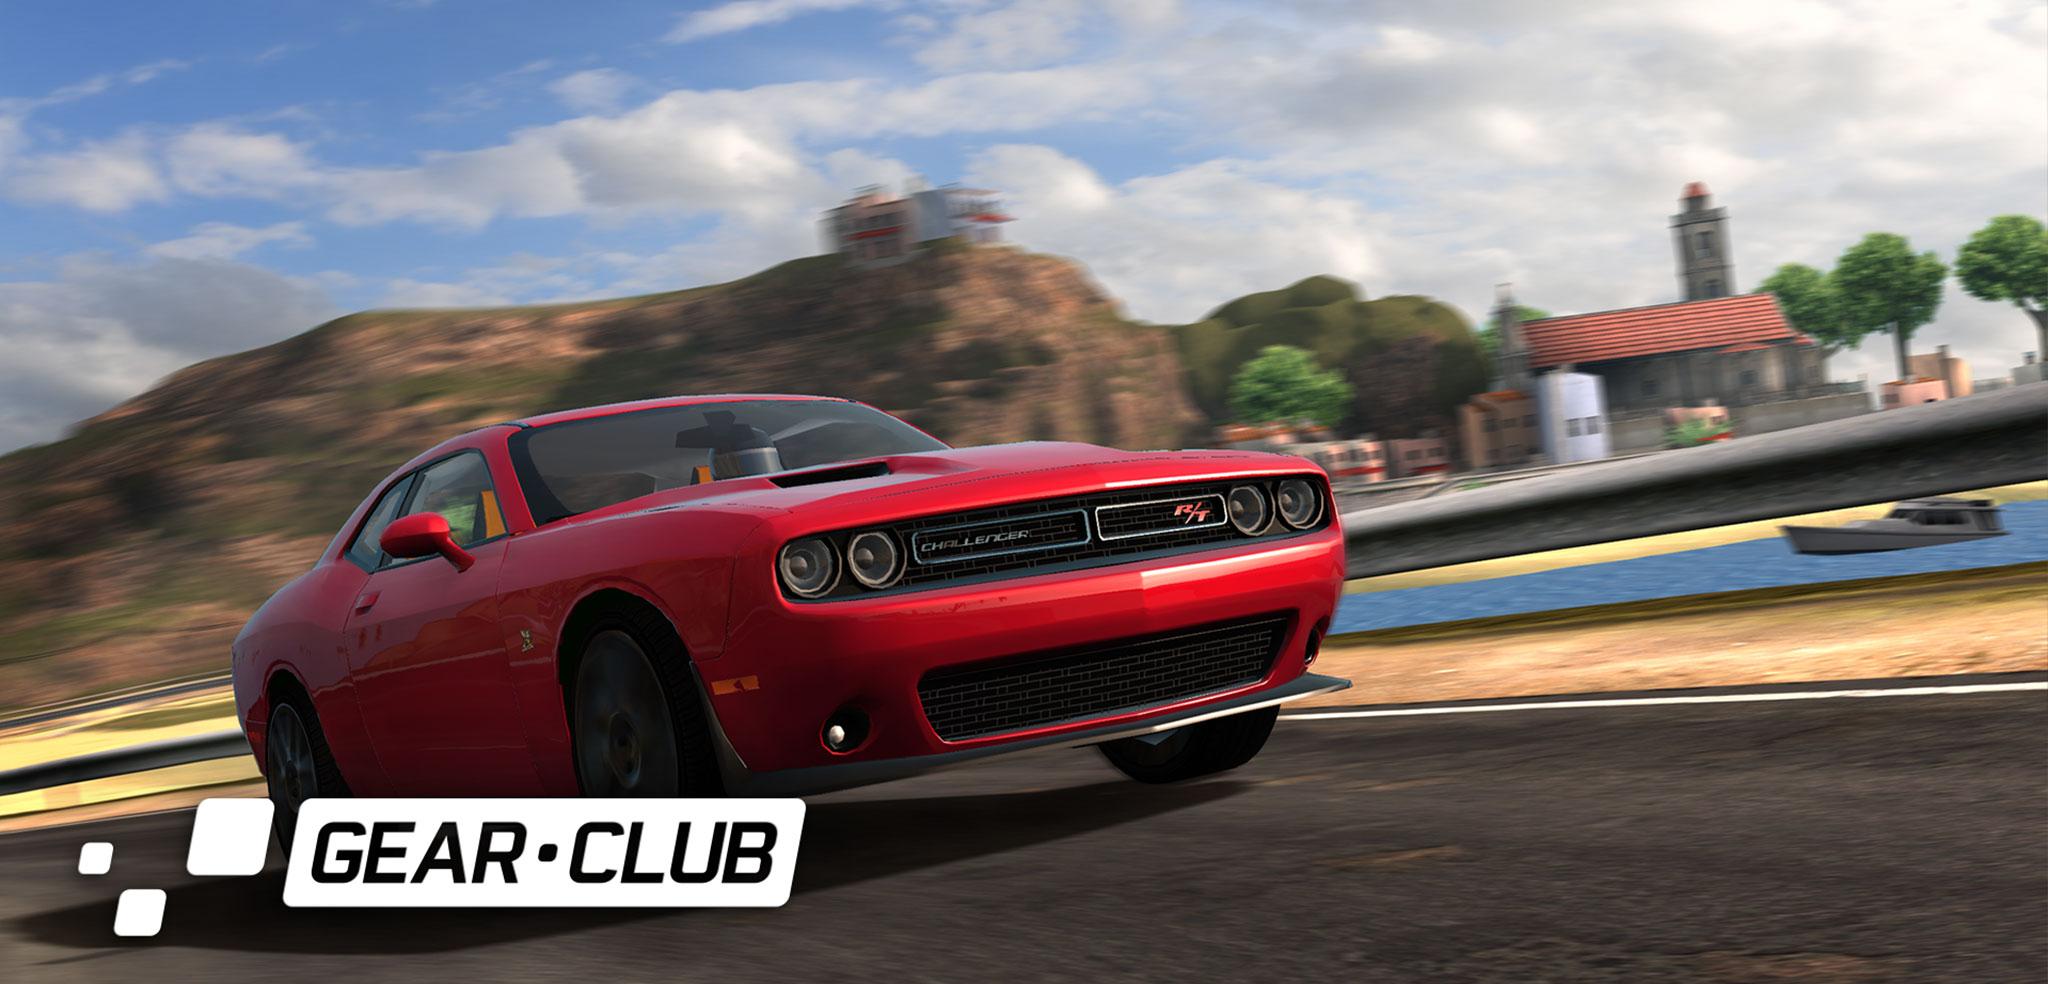 Gear.Club Races to Switch Gear-Club-edengames-slide-05